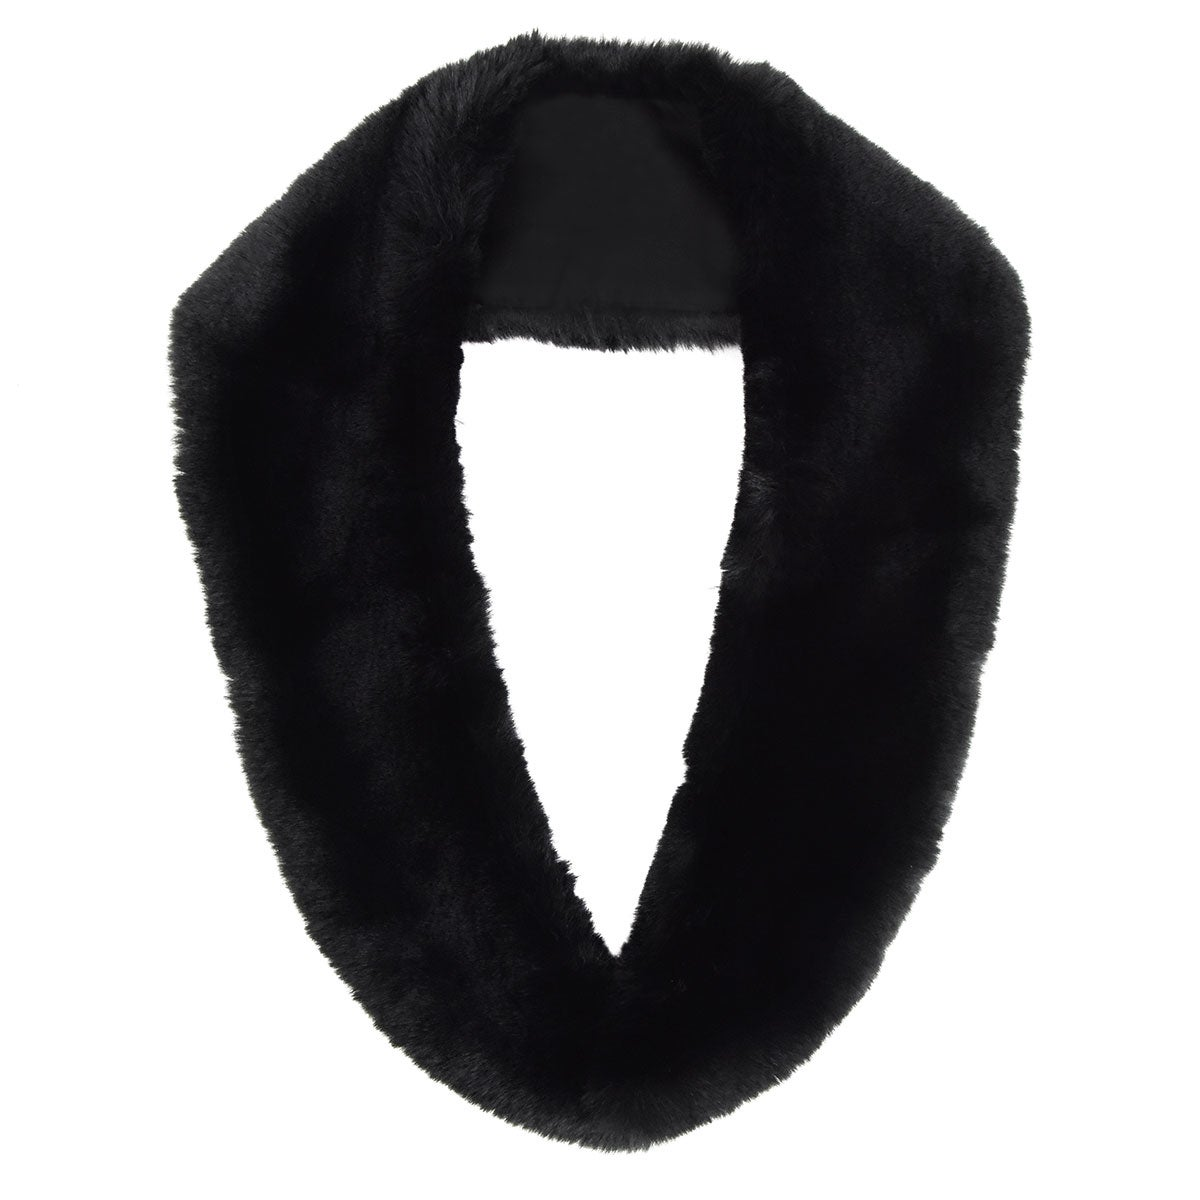 Helen Kaminski Kelly Large Infinity Scarf in Black